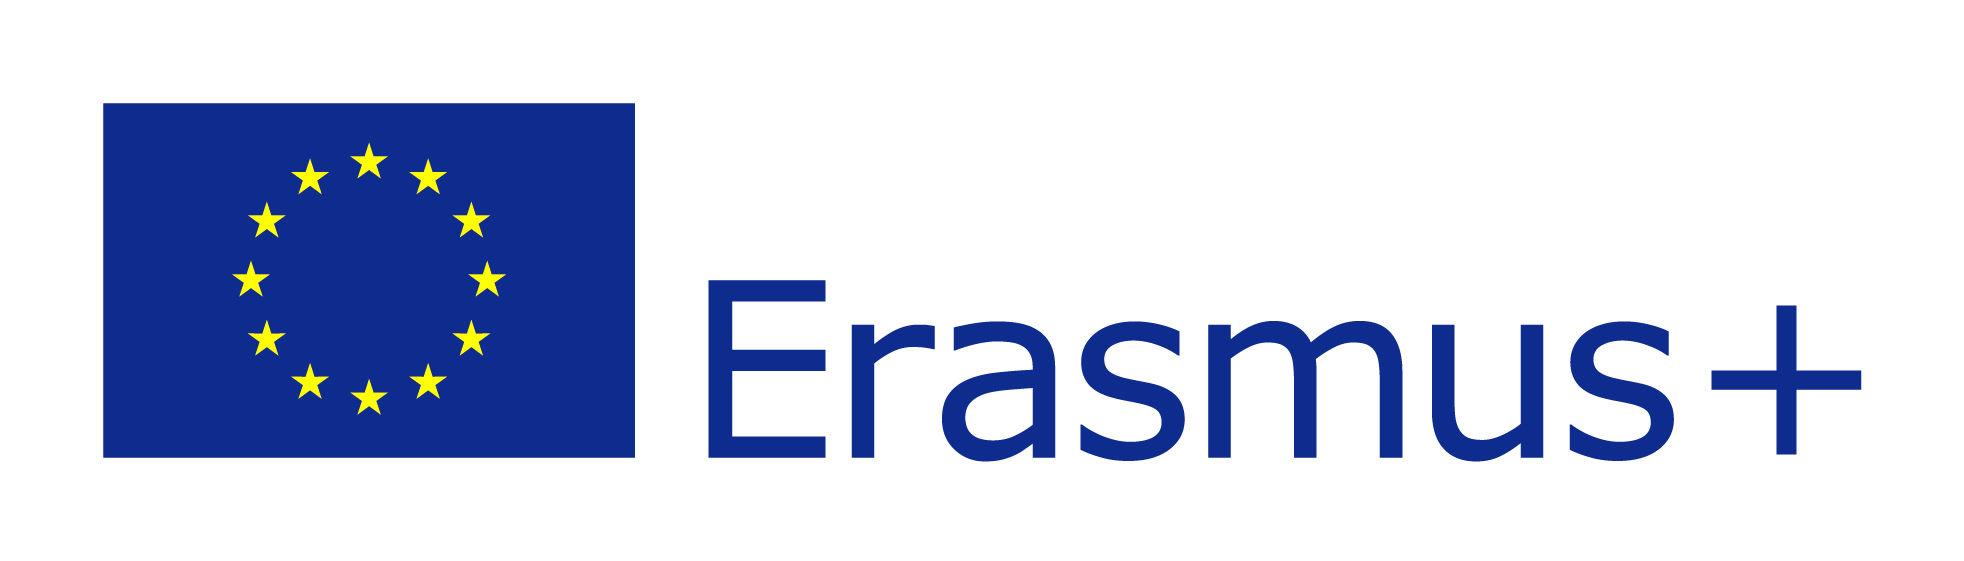 ErasmusLogo.jpg